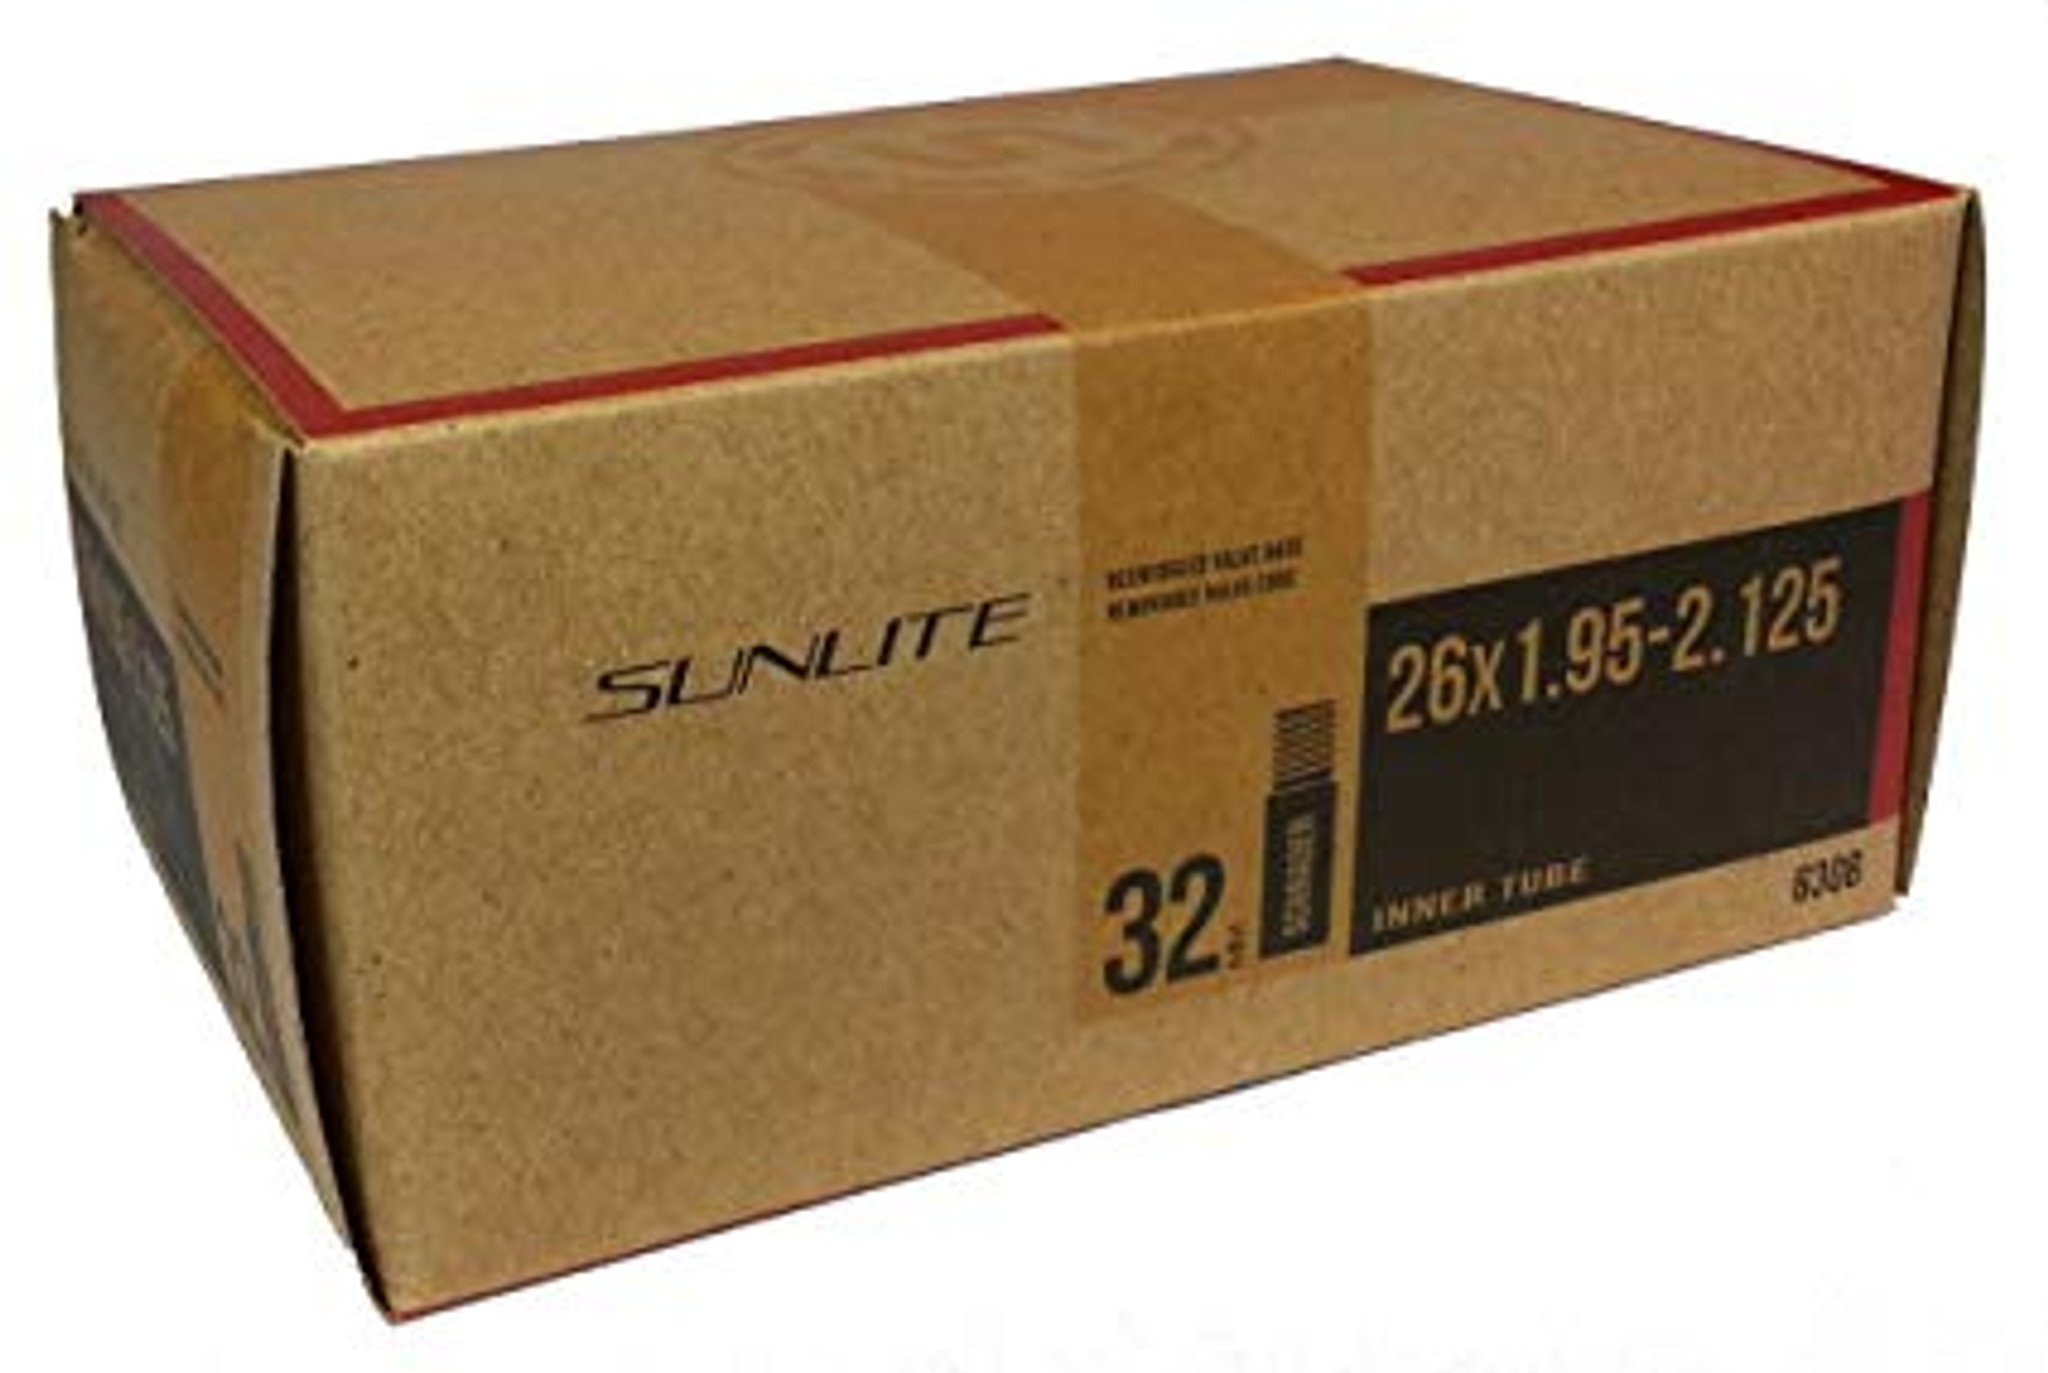 "Sunlite Bicycle Tube 26 x 1.95-2.125/"" Schrader Valve"